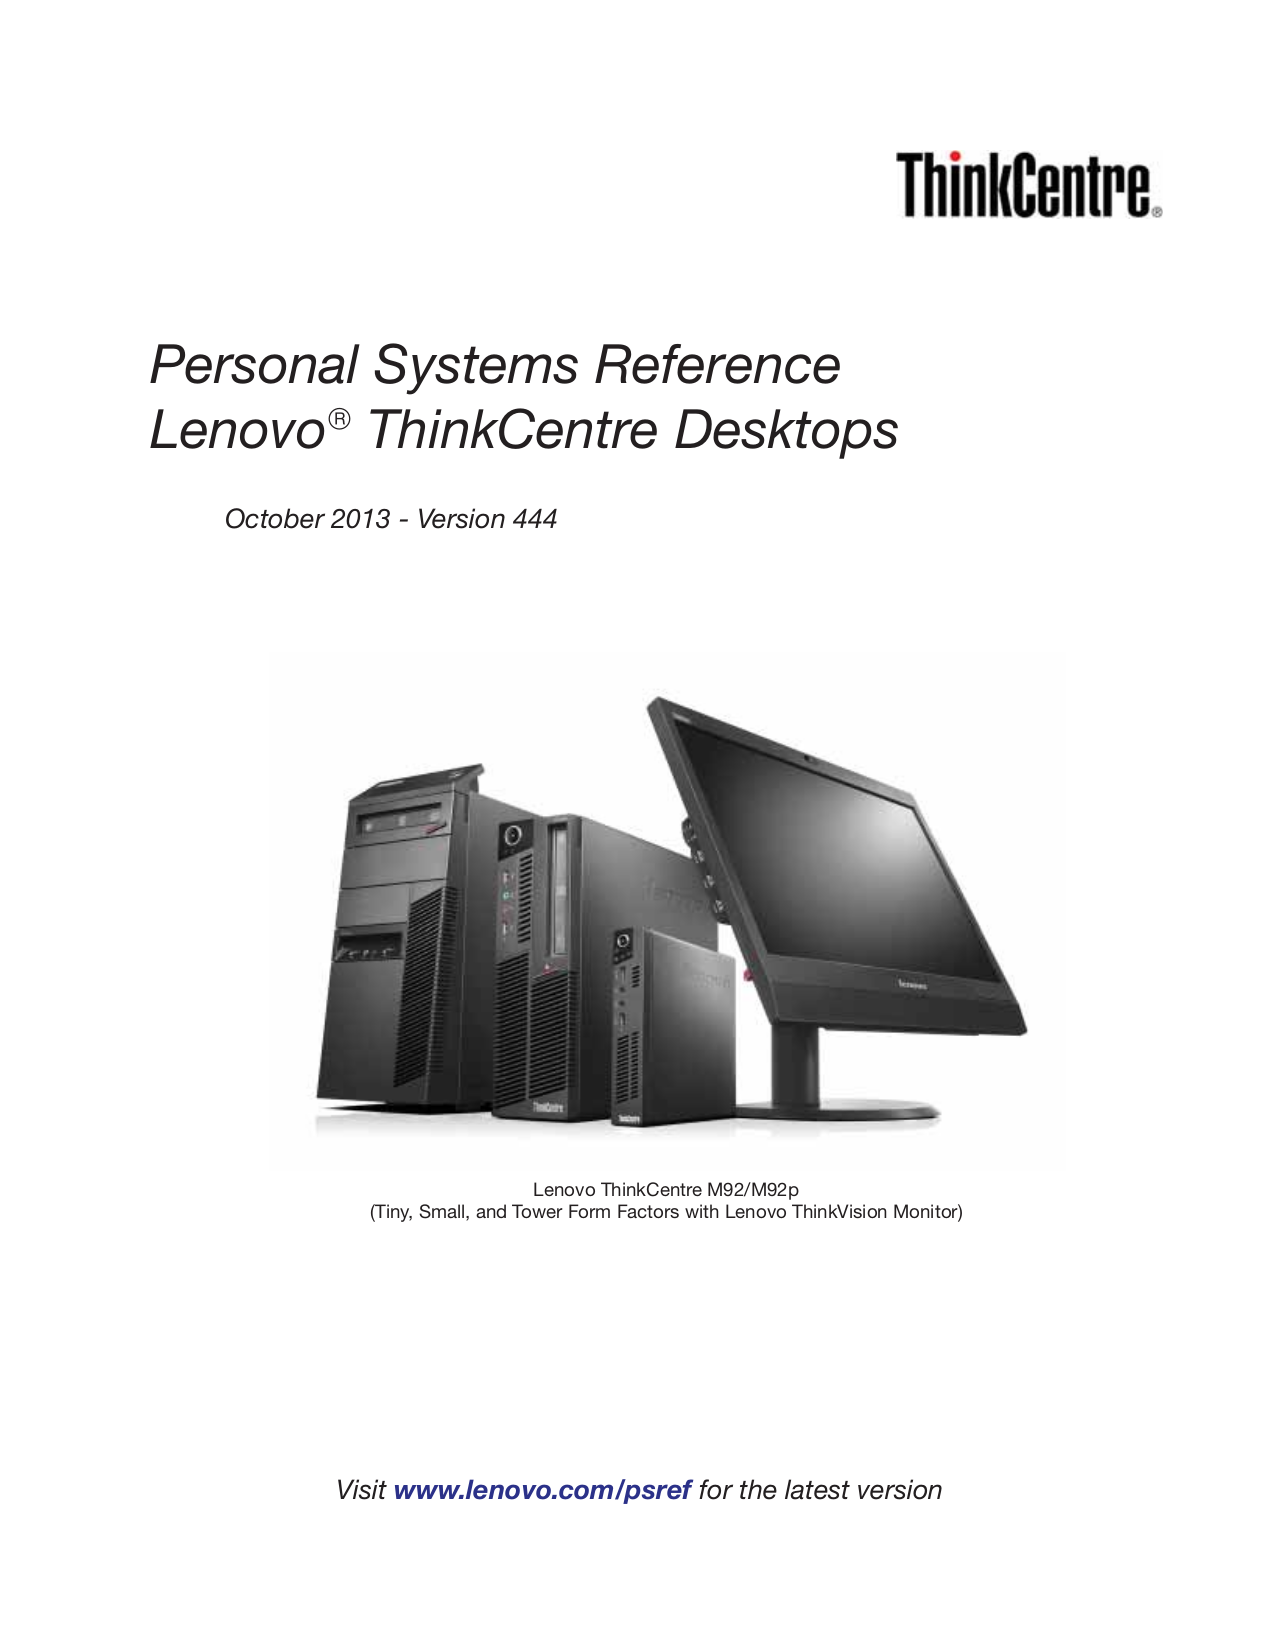 pdf for Lenovo Desktop ThinkCentre M77 1990 manual